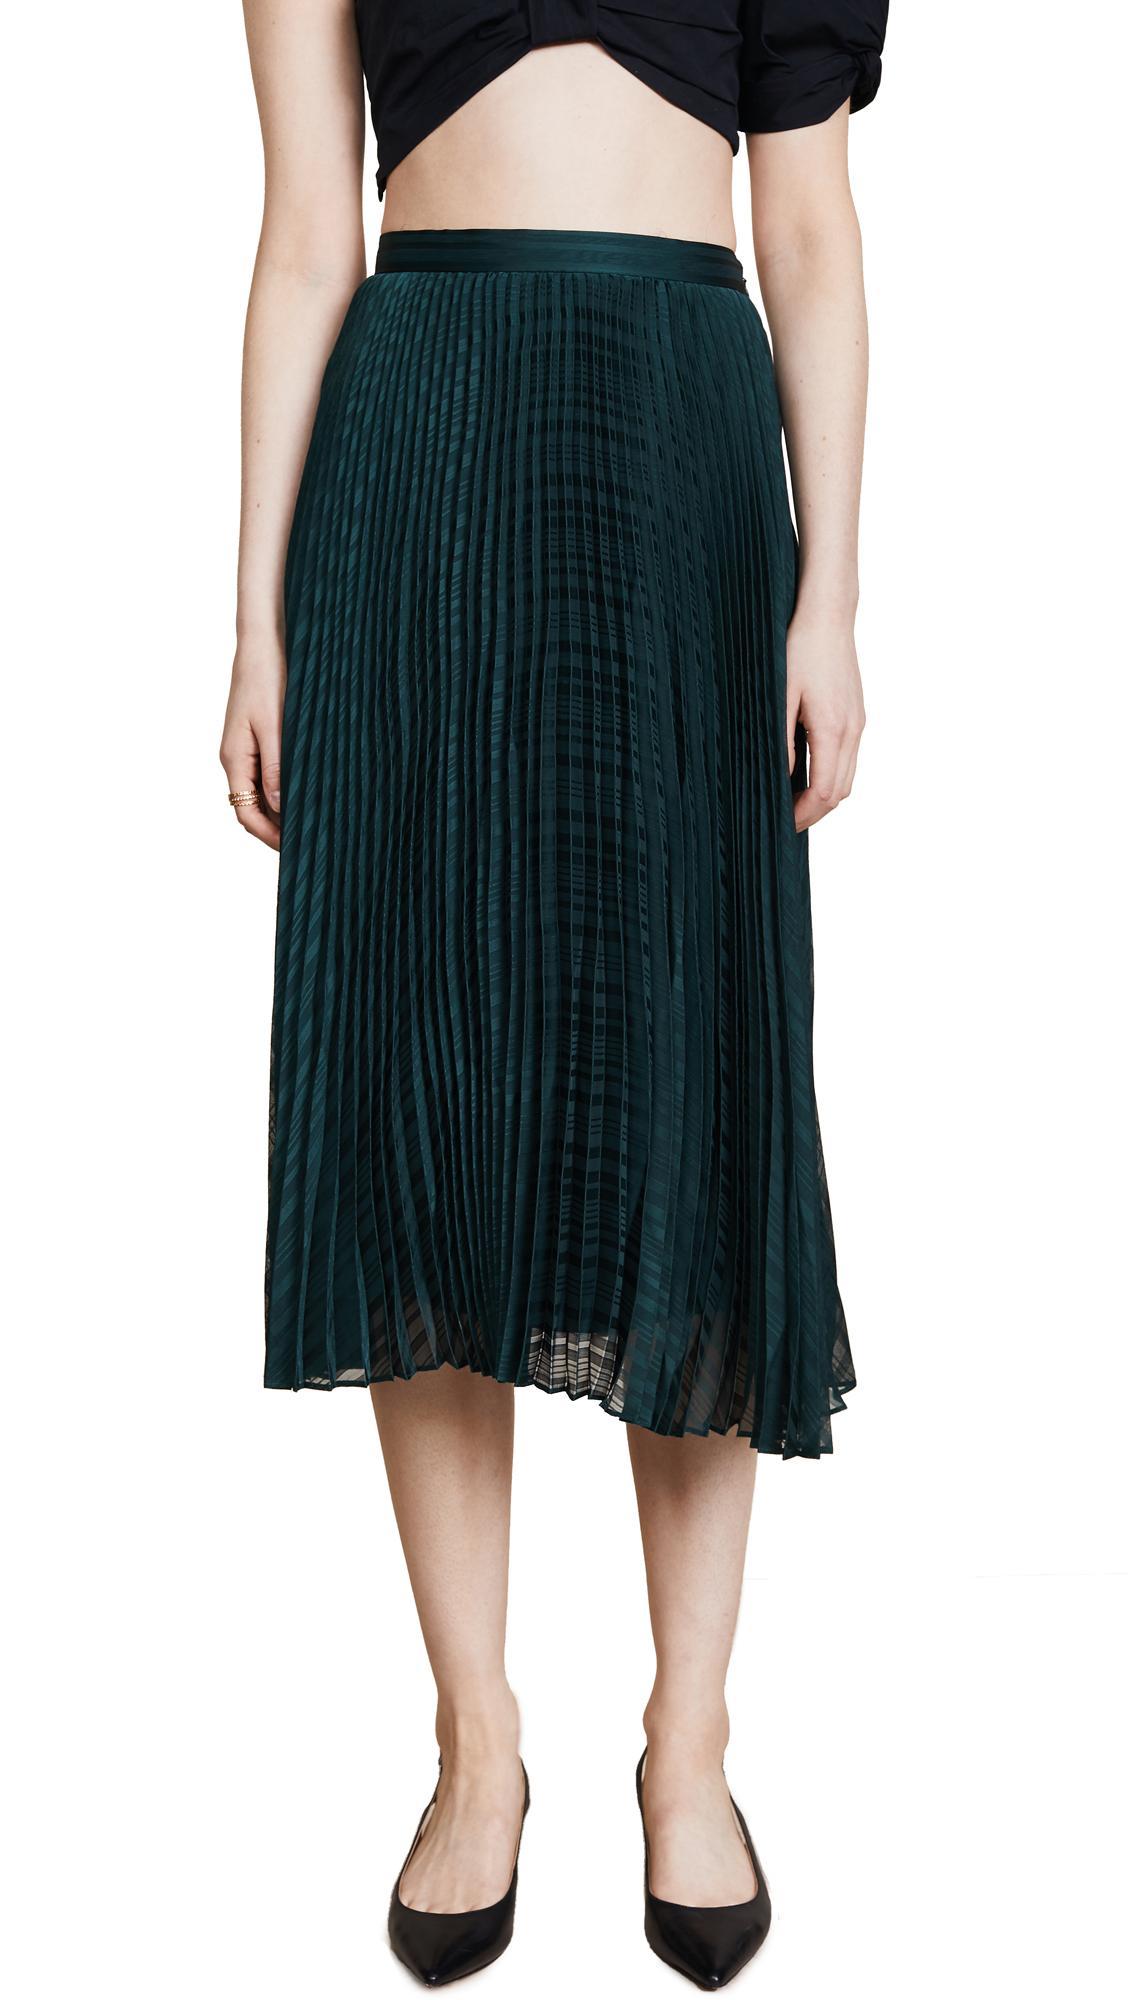 f618bf809b Club Monaco Behtina Skirt In Palm Green   ModeSens